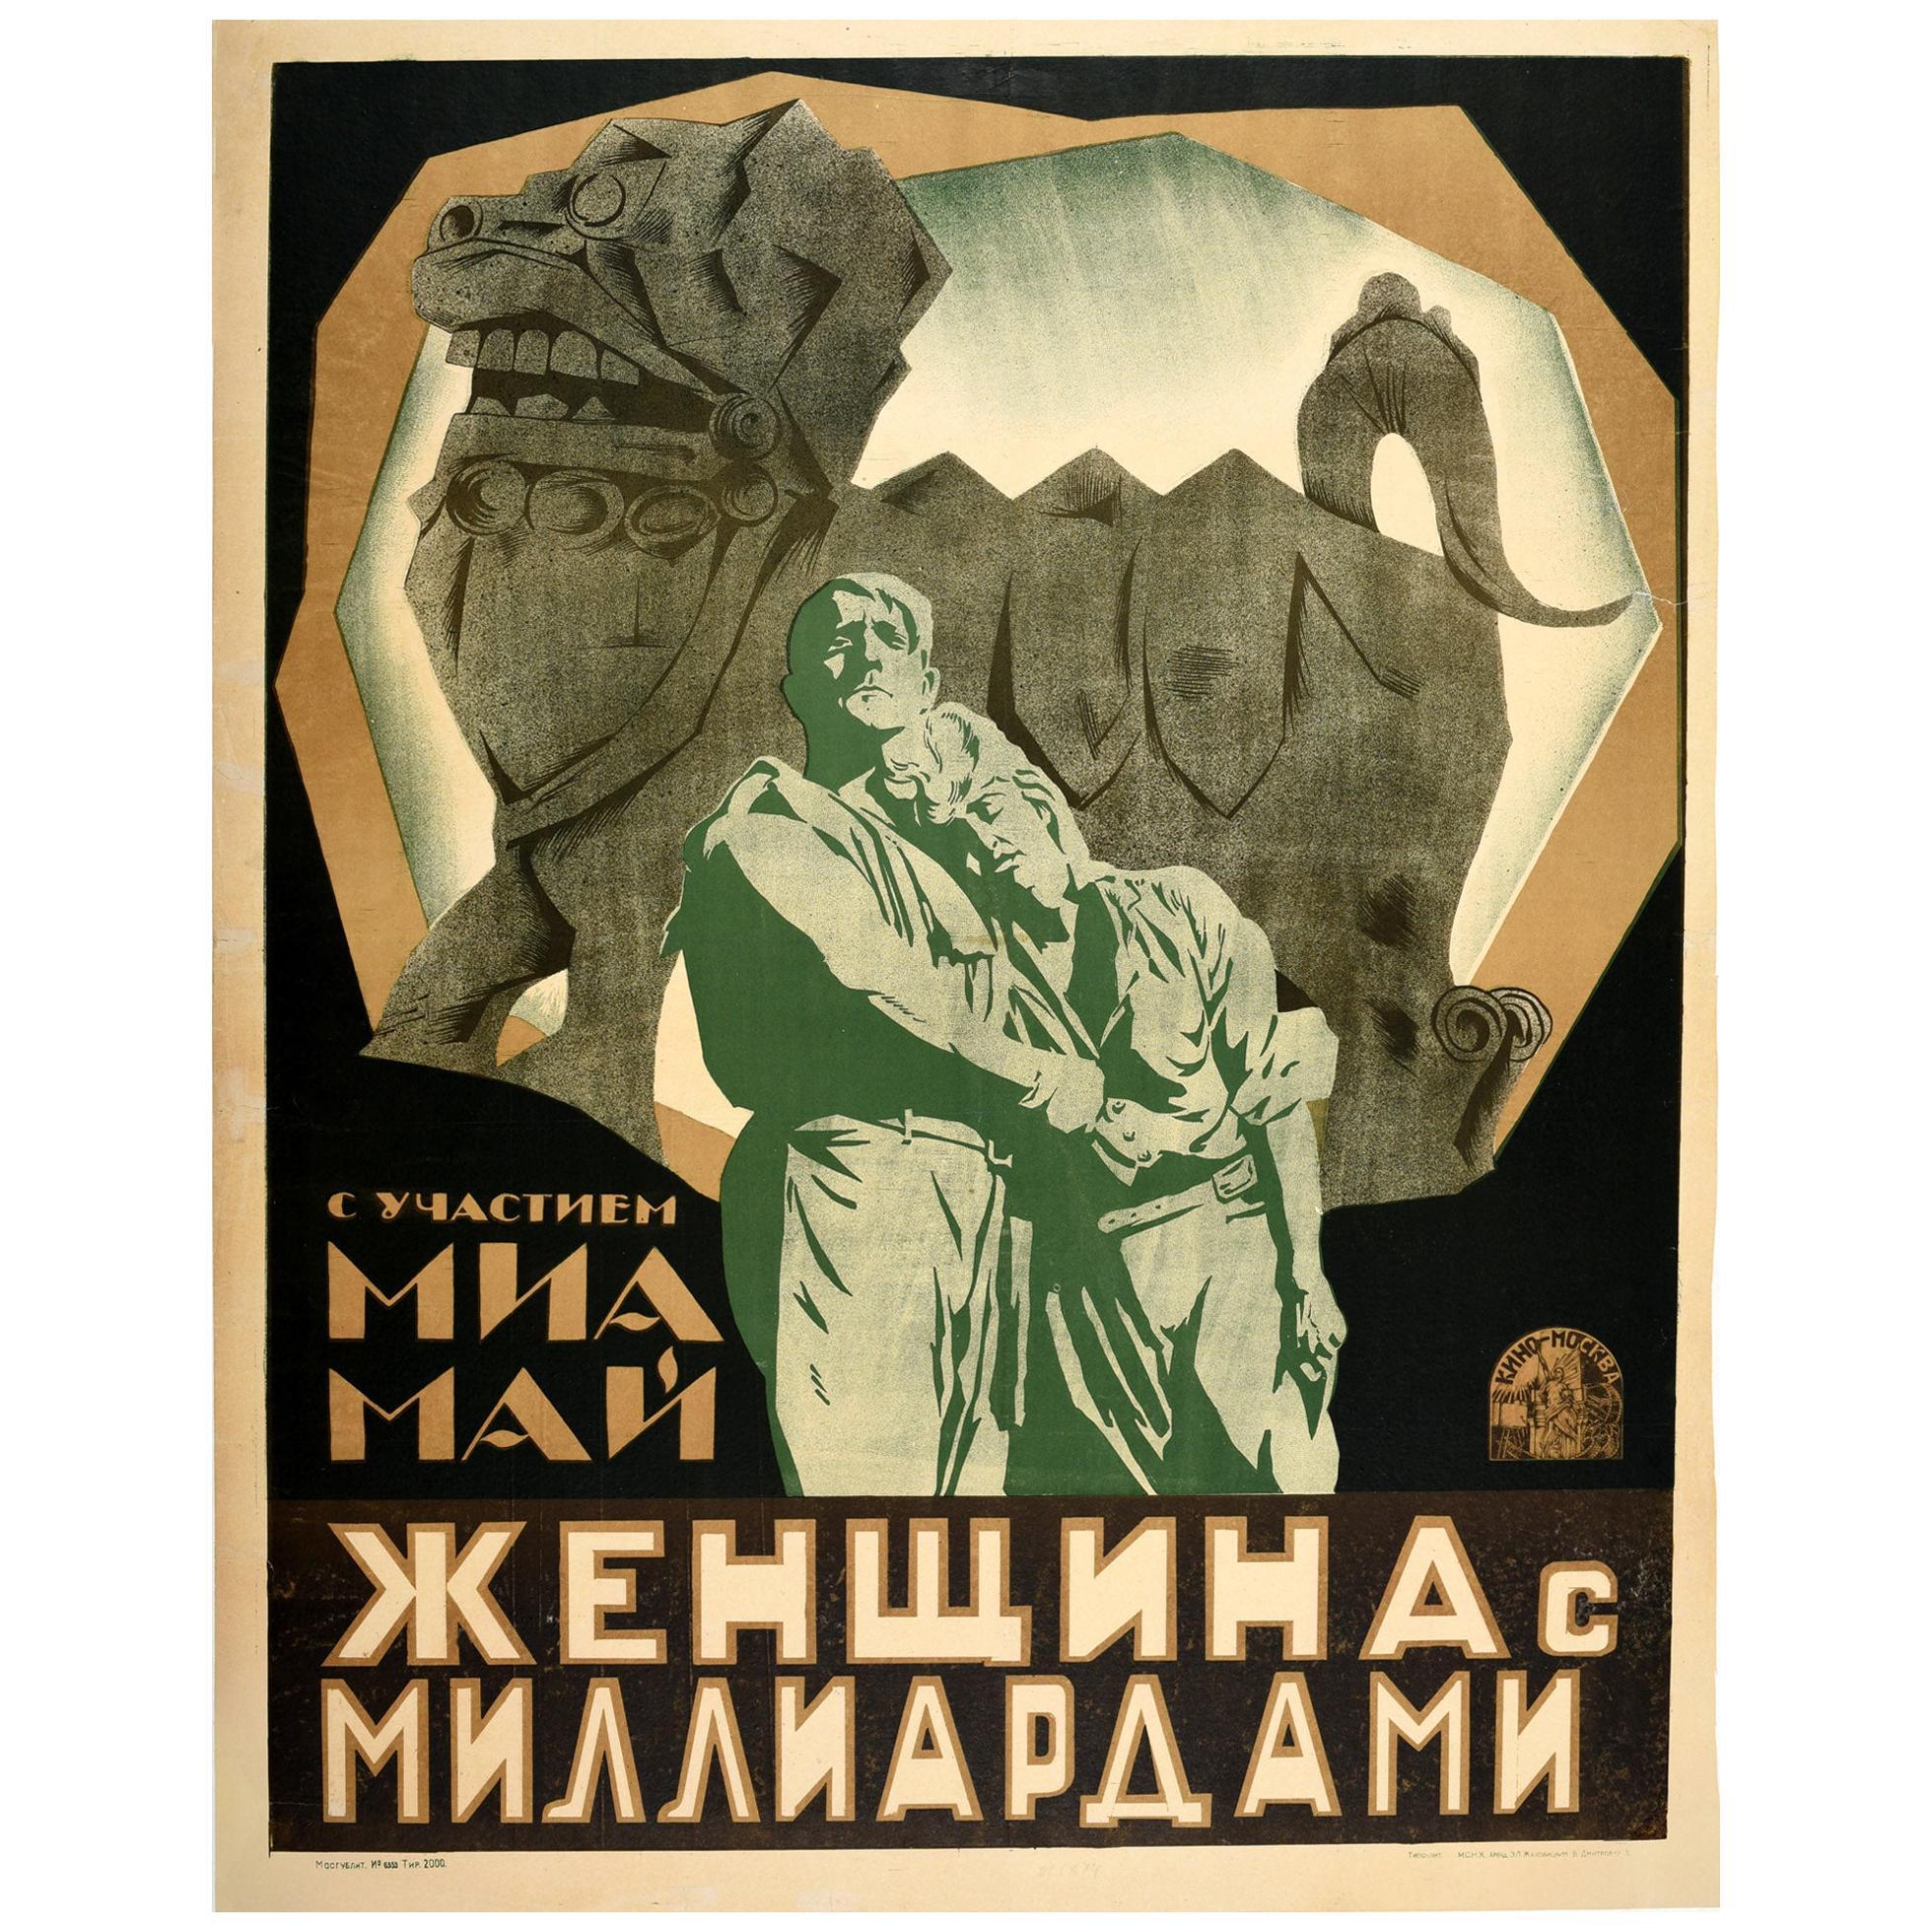 Original Vintage Soviet Movie Poster Mistress Of The World Mia May Silent Film